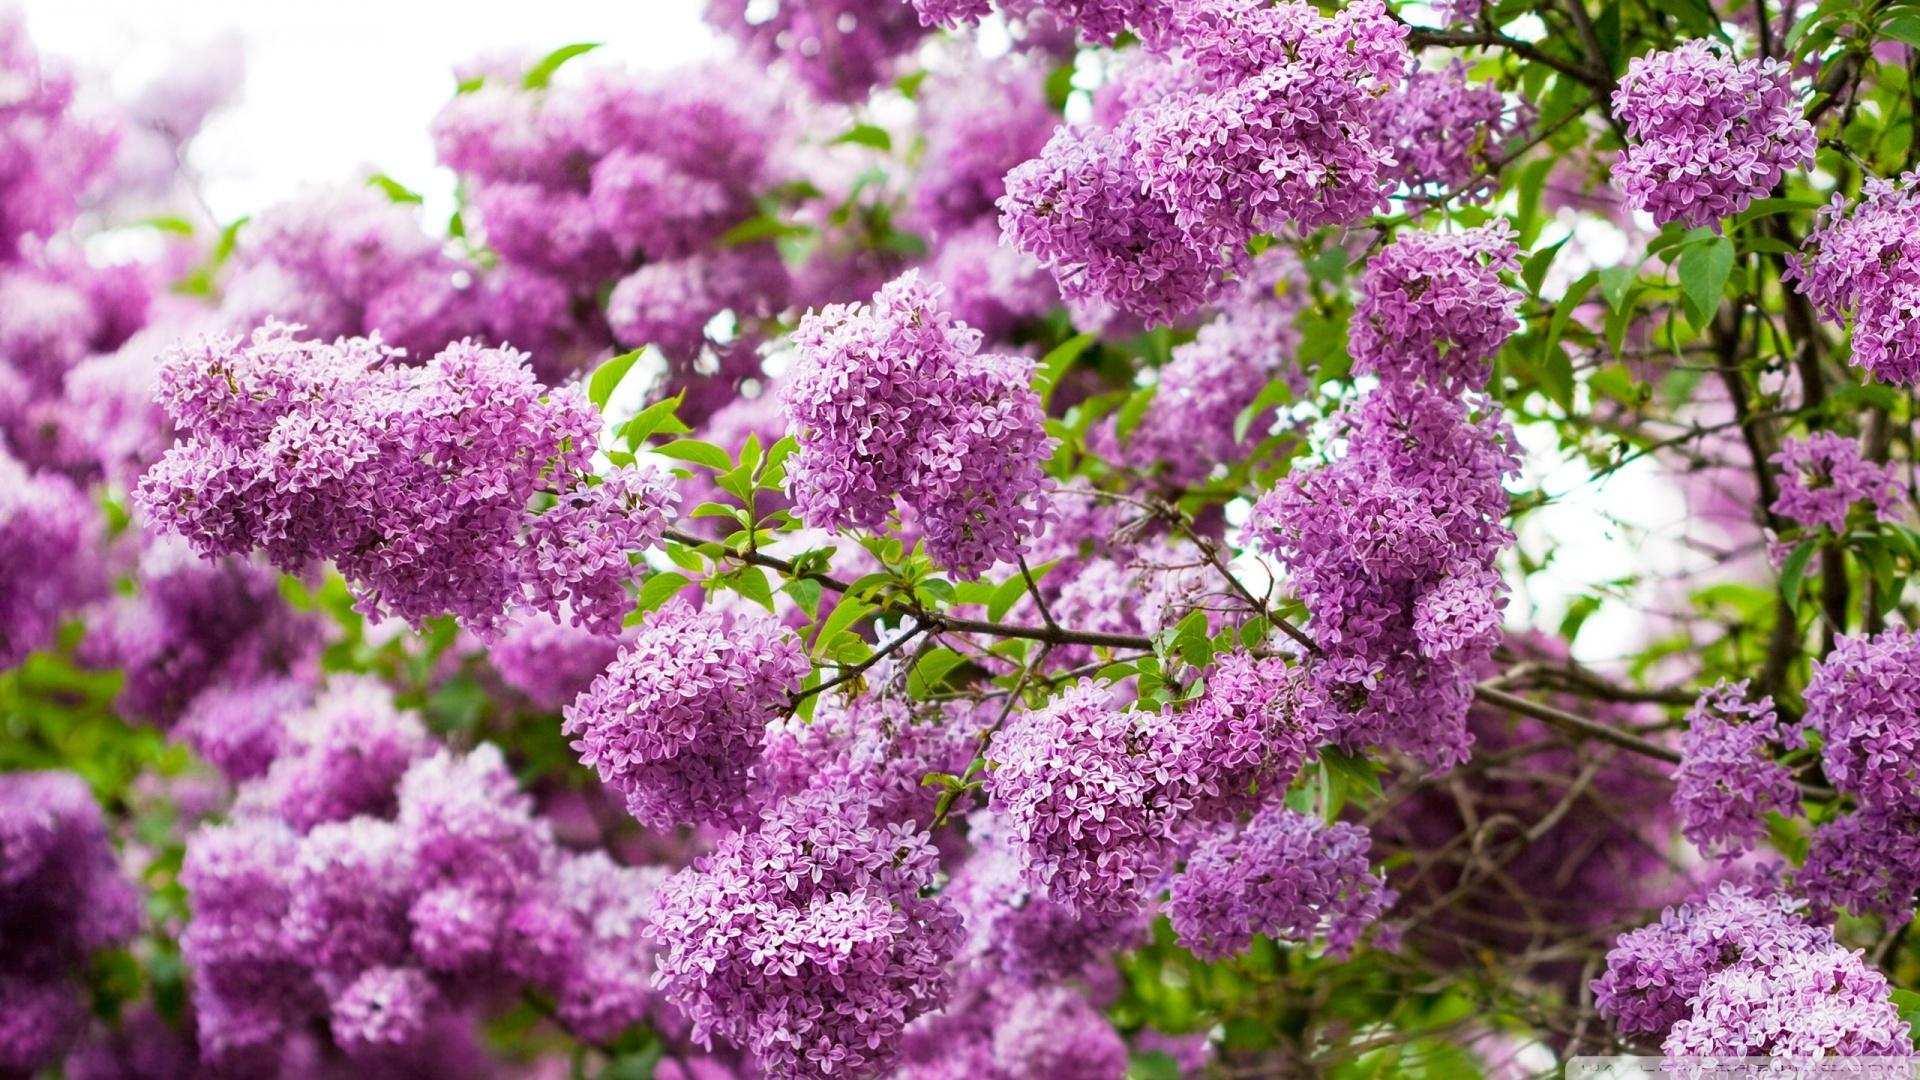 Lilac Blossom Wallpaper 1920x1080 Lilac Blossom 1920x1080